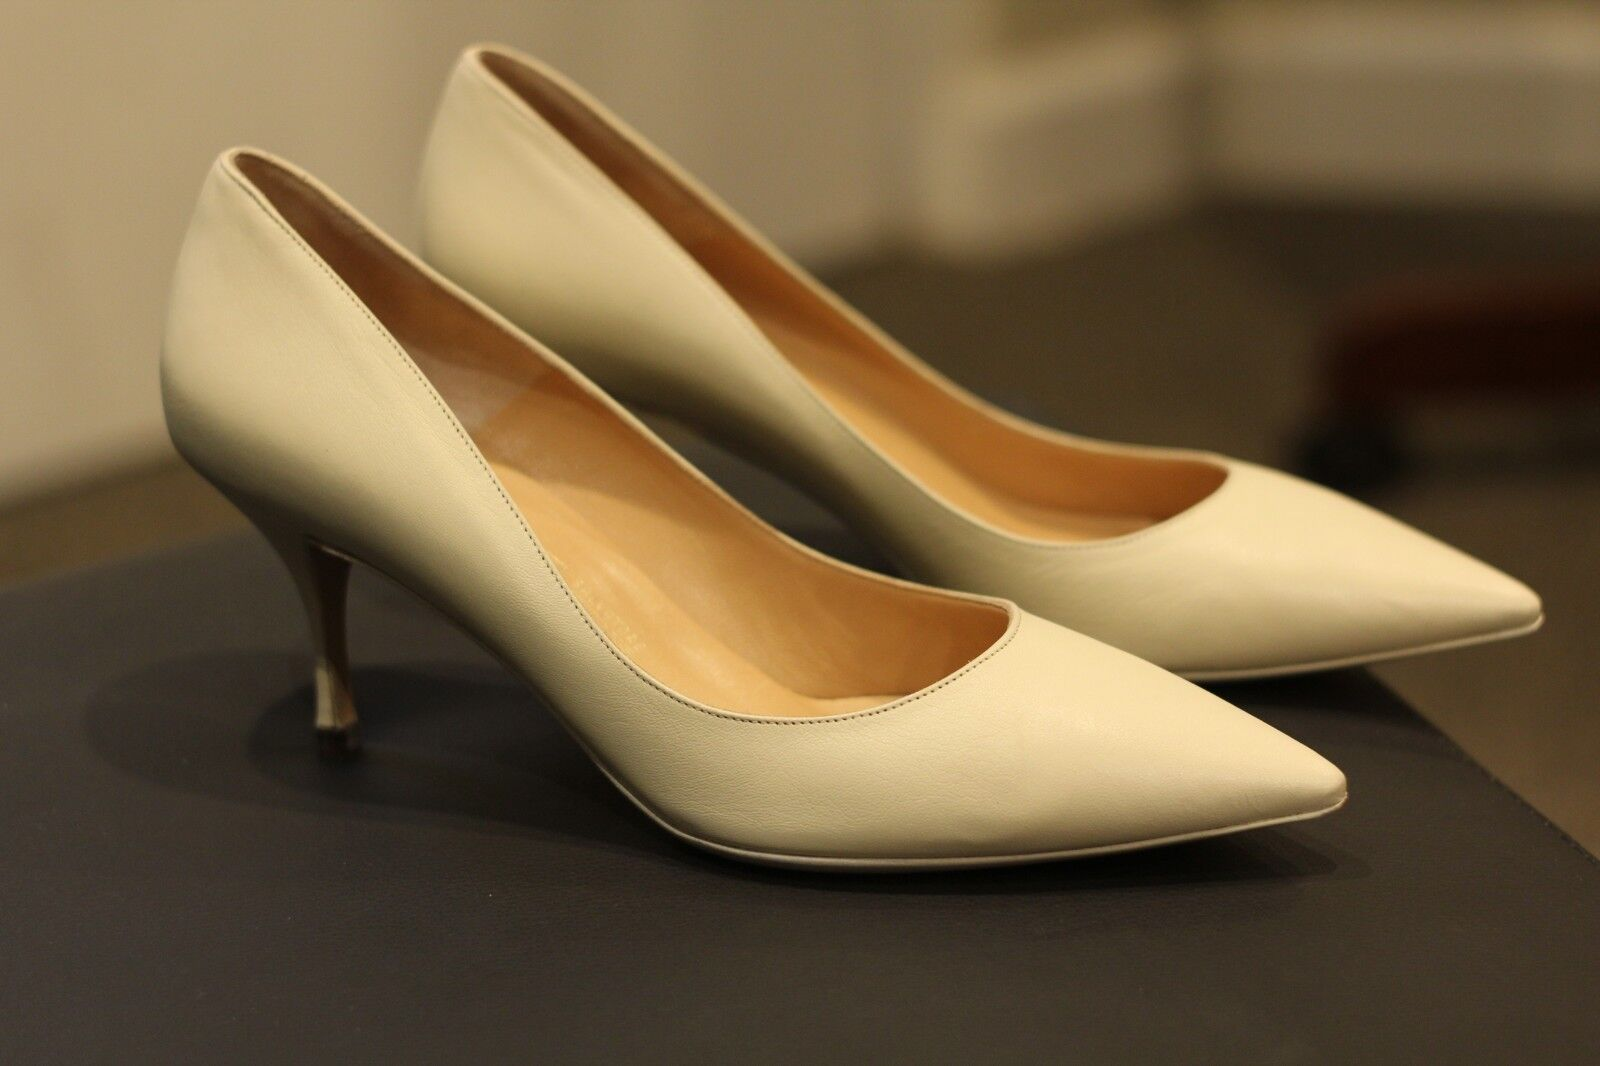 Salvatore Ferragamo Magnolia Kid Cream Leather Pumps Heels Heels Heels Italian schuhe Größe 9B f3d6f0